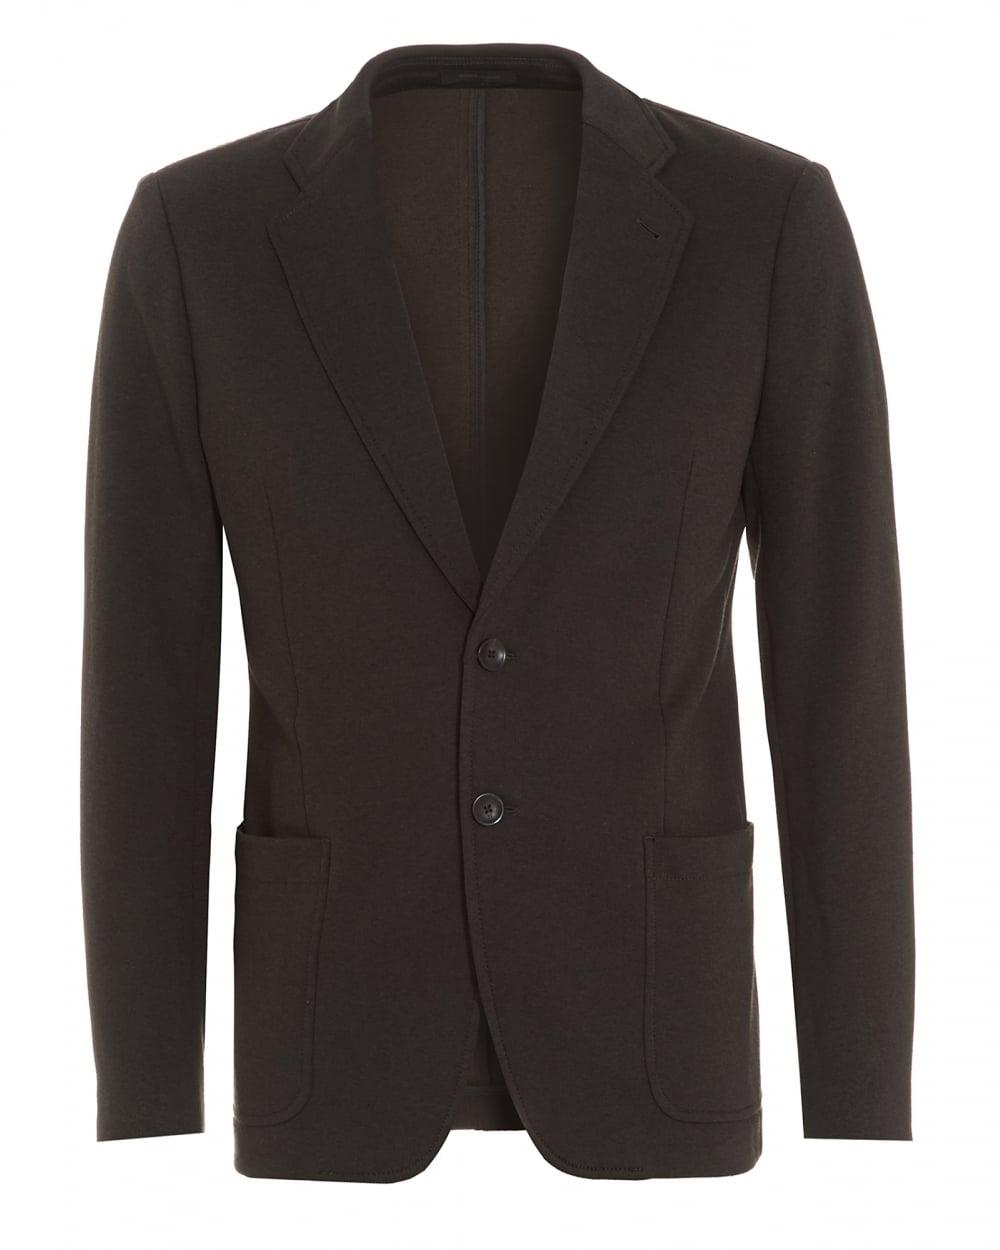 low priced bbcd5 2782e Mens Single Breast Grey Blazer Jacket